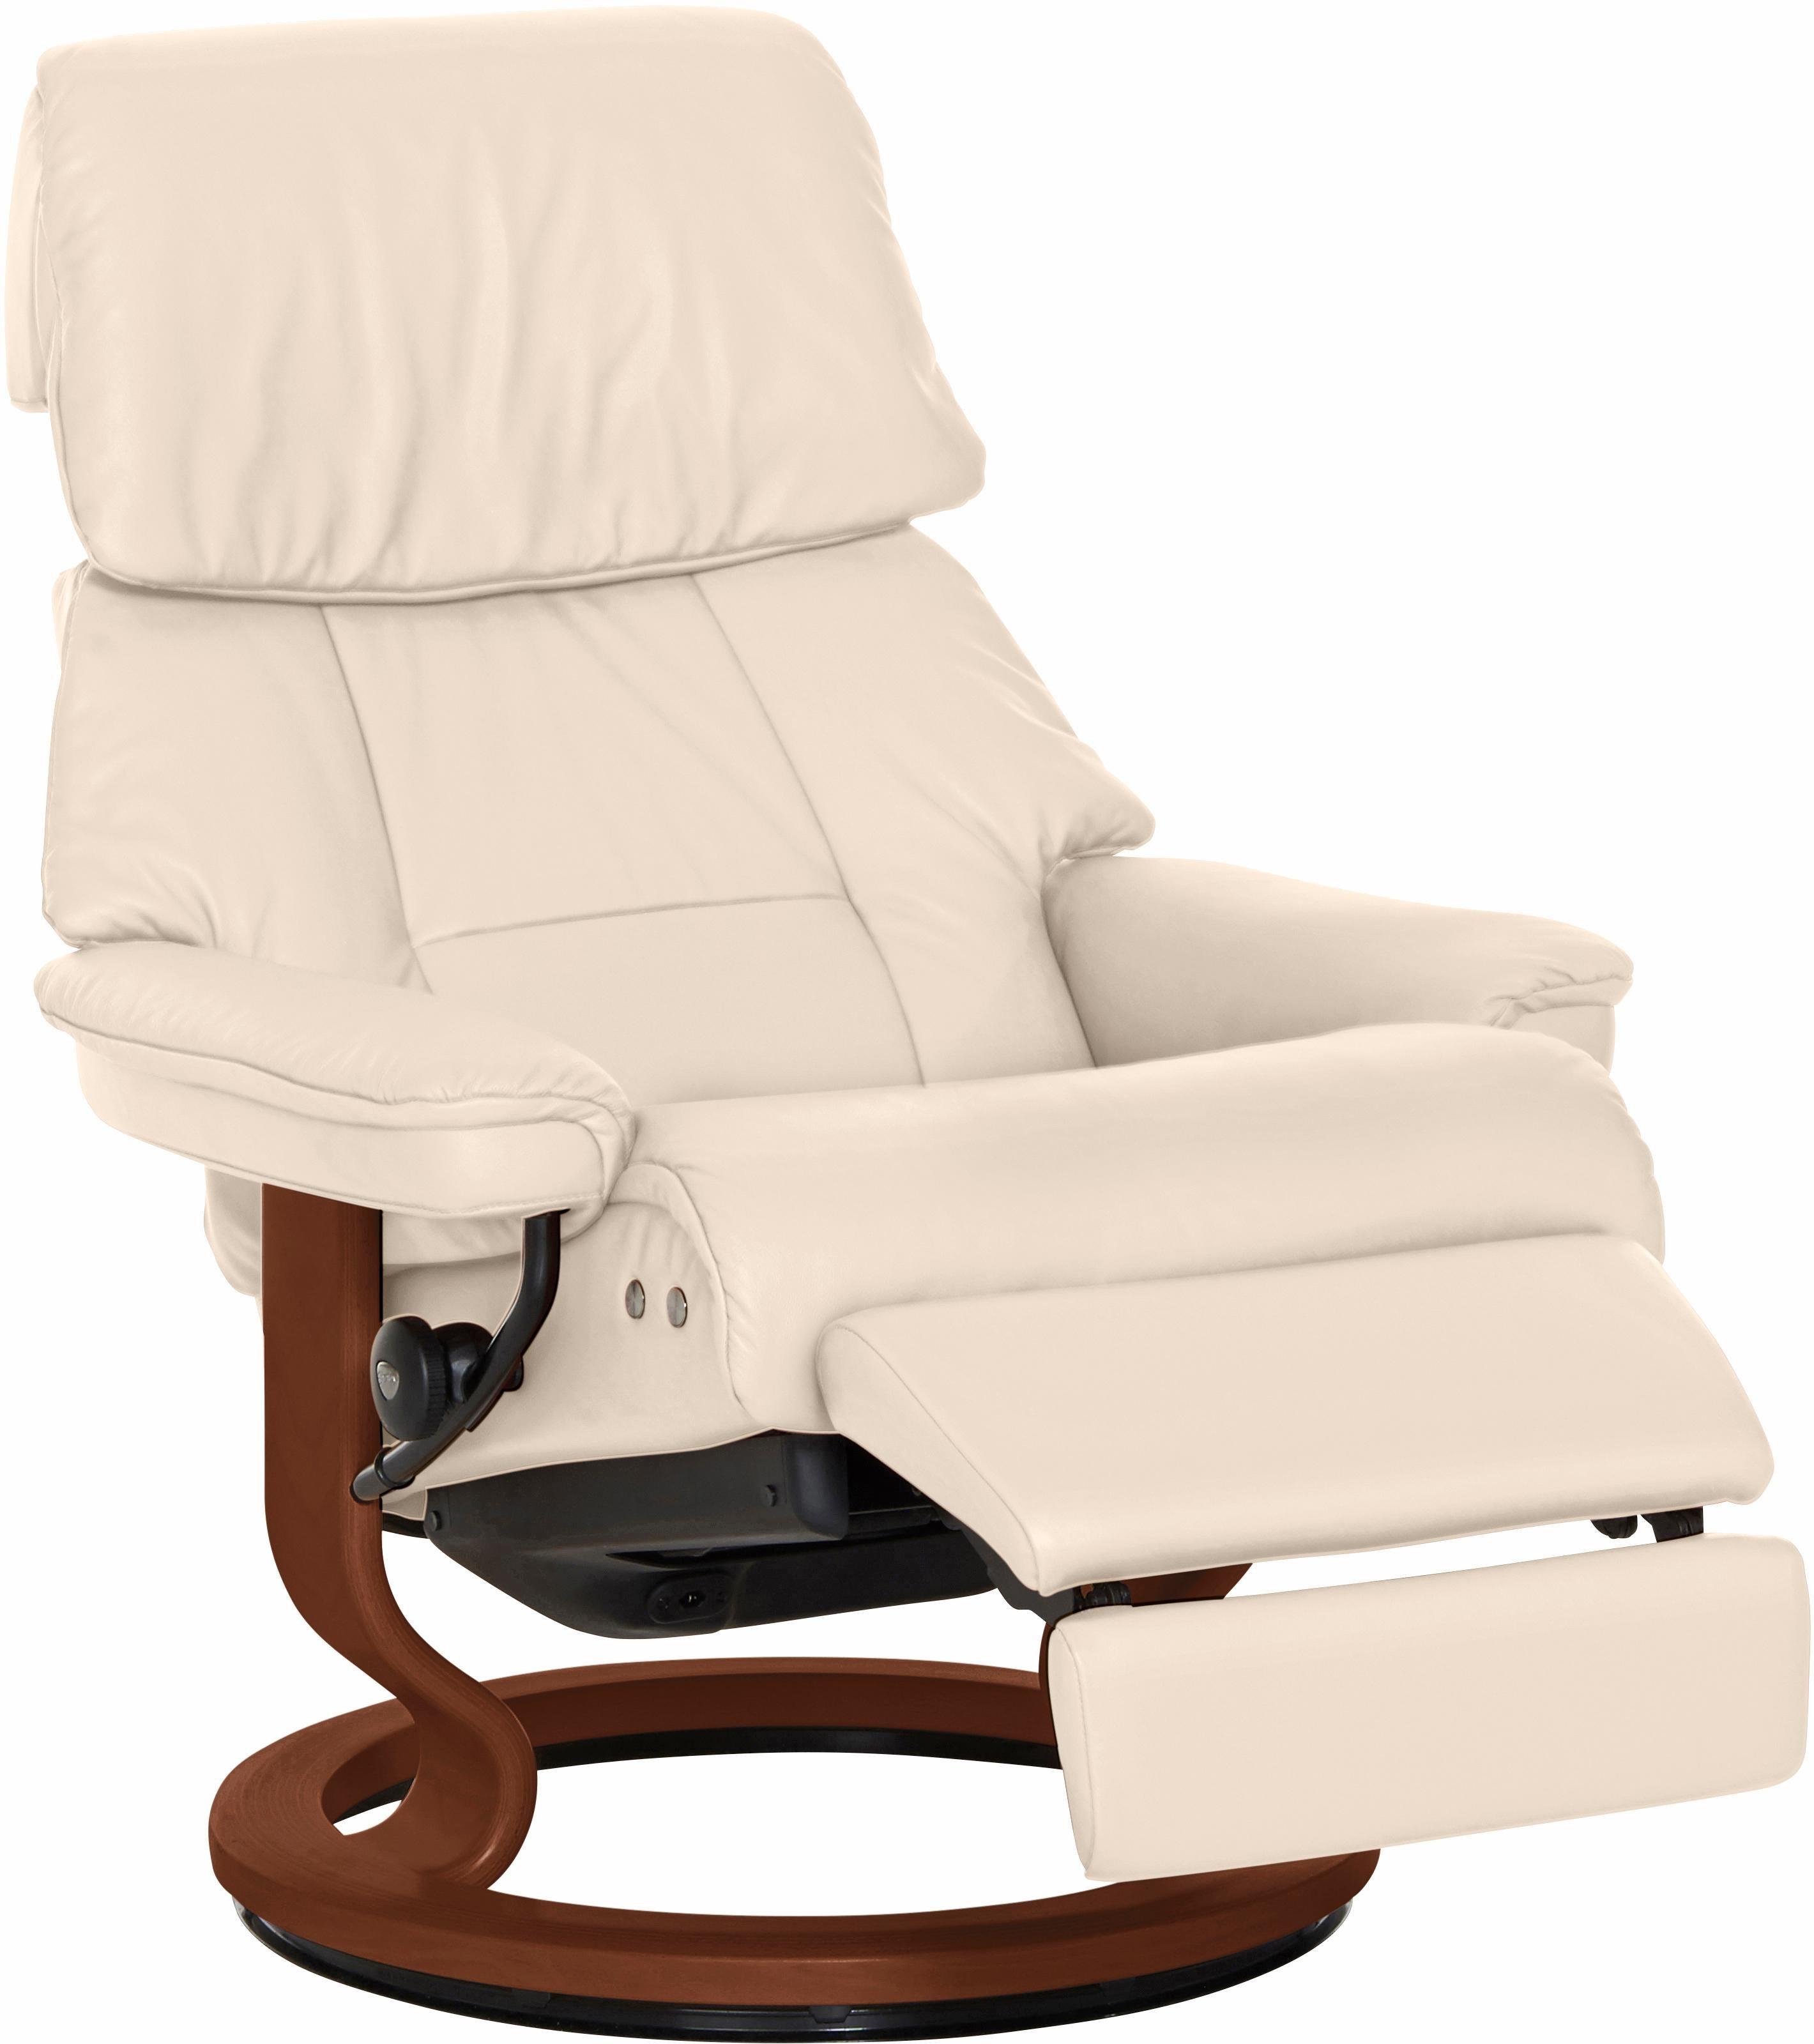 beige materialmix relaxsessel online kaufen m bel suchmaschine. Black Bedroom Furniture Sets. Home Design Ideas